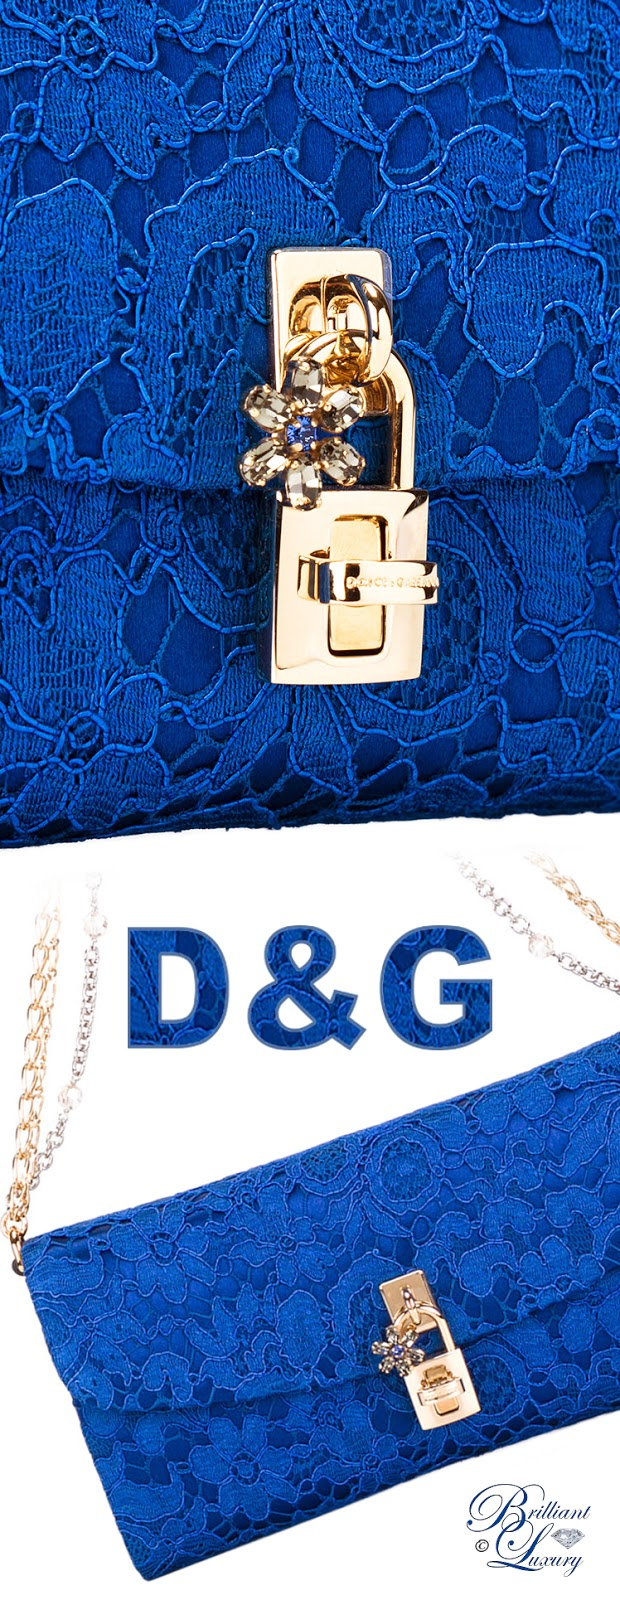 Brilliant Luxury ♦ Dolce & Gabbana Dolce Clutch